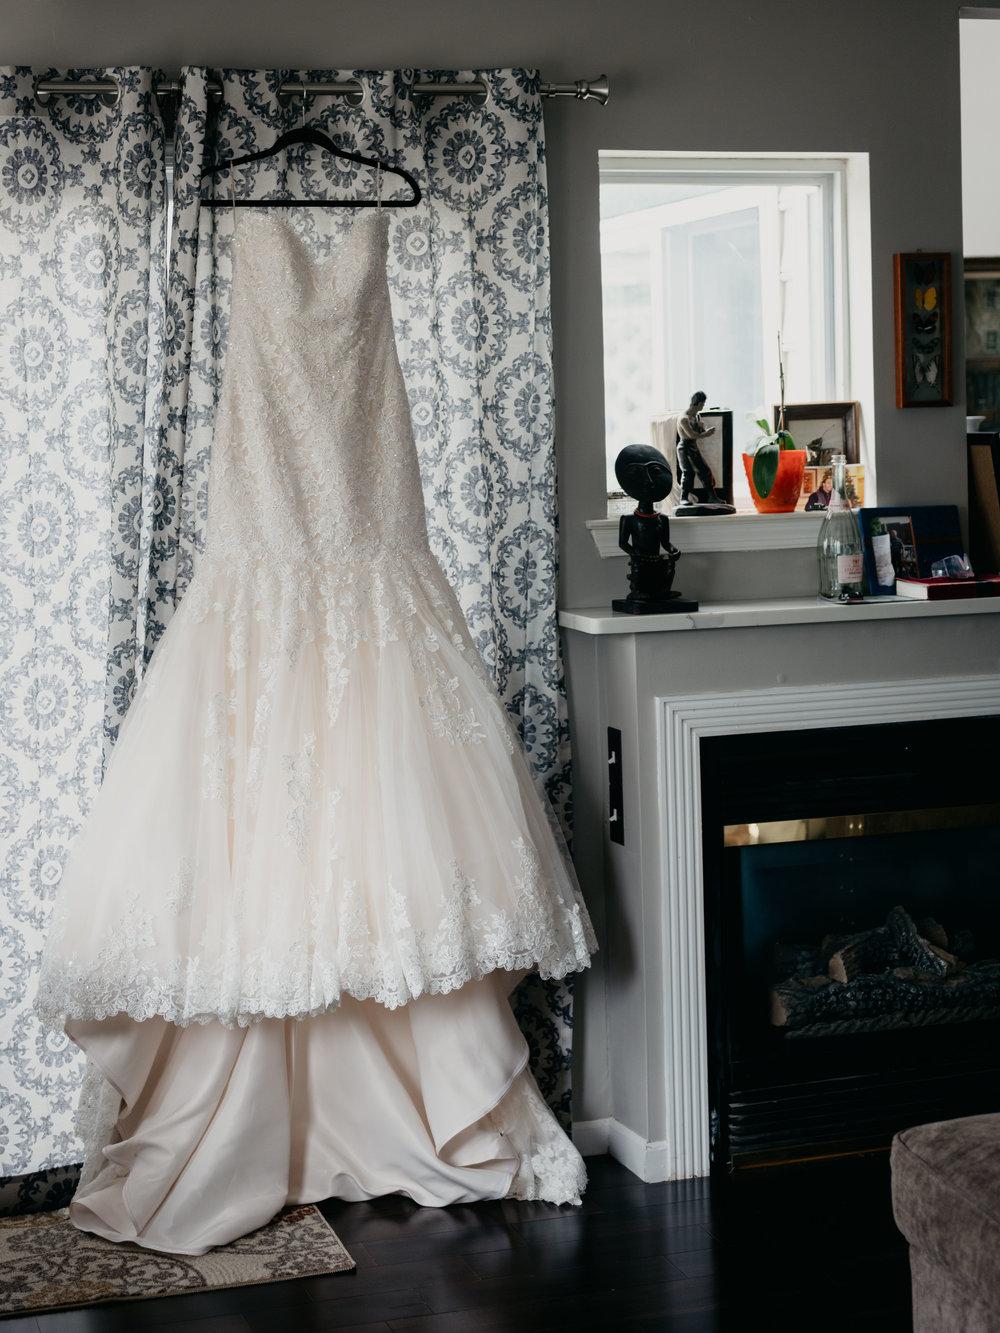 WSPCO-08122017-DaJa-Odalis-Wedding-Preview-20.jpg